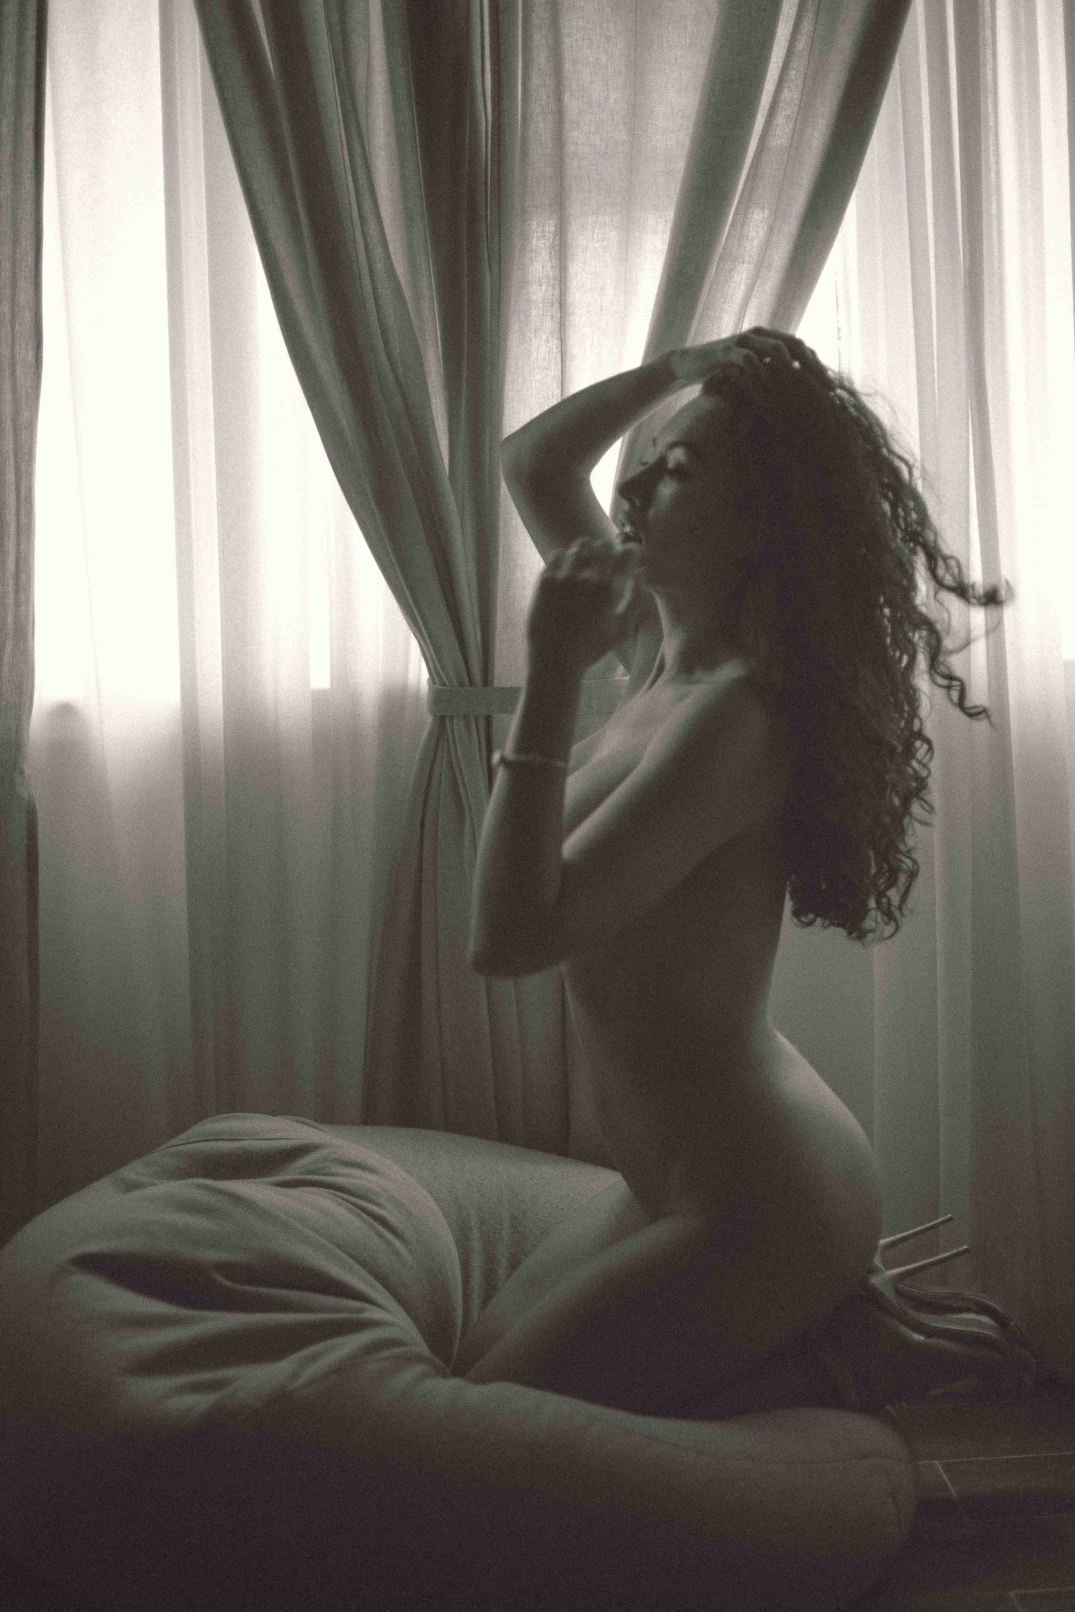 boudior nude photography HK by paulstylist-24